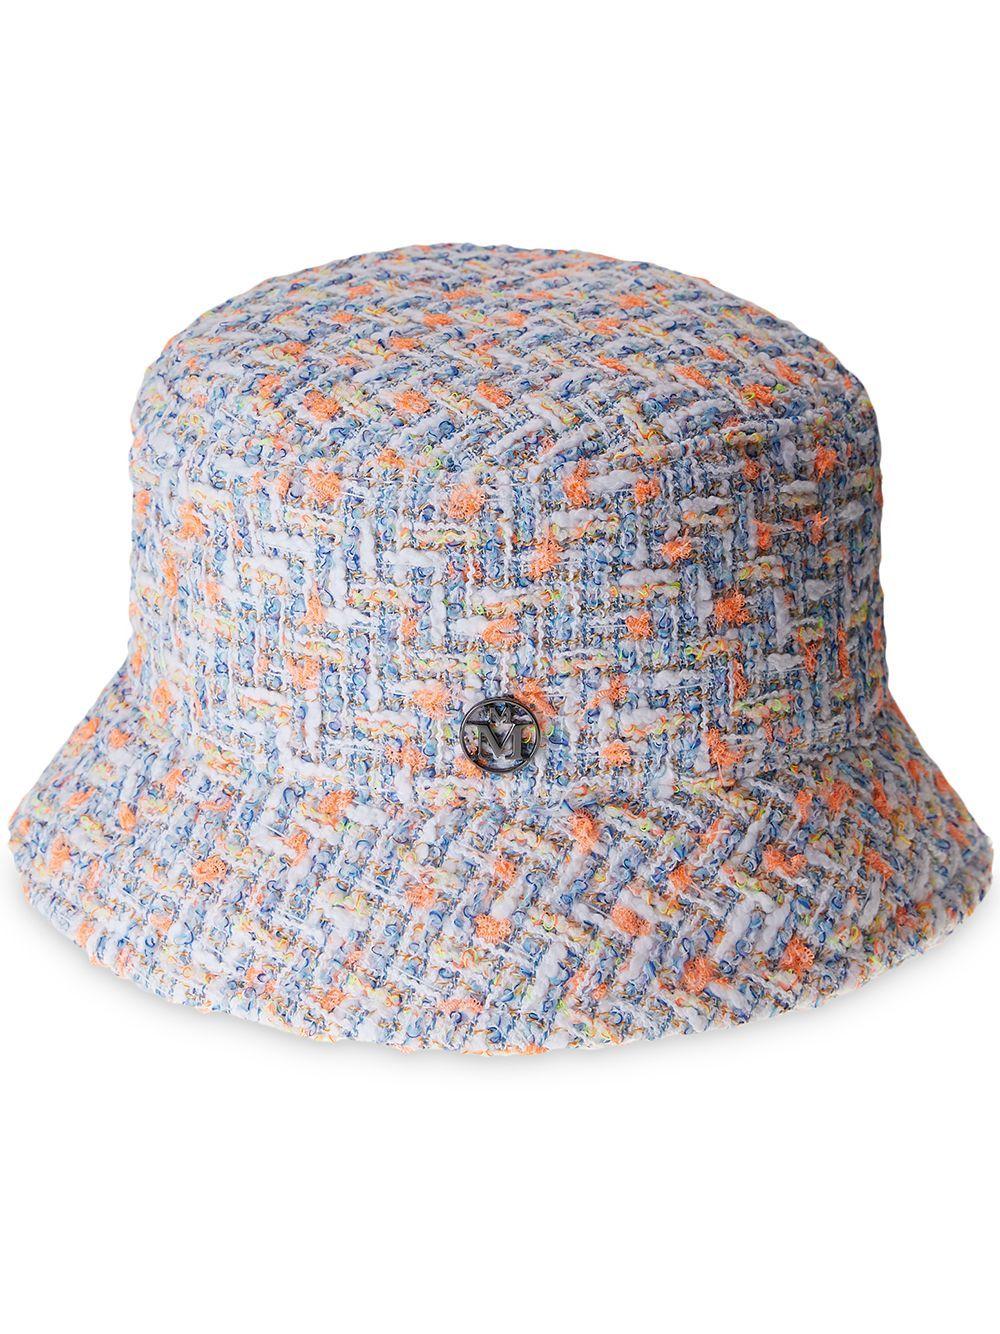 Cappelloaxel in tweed